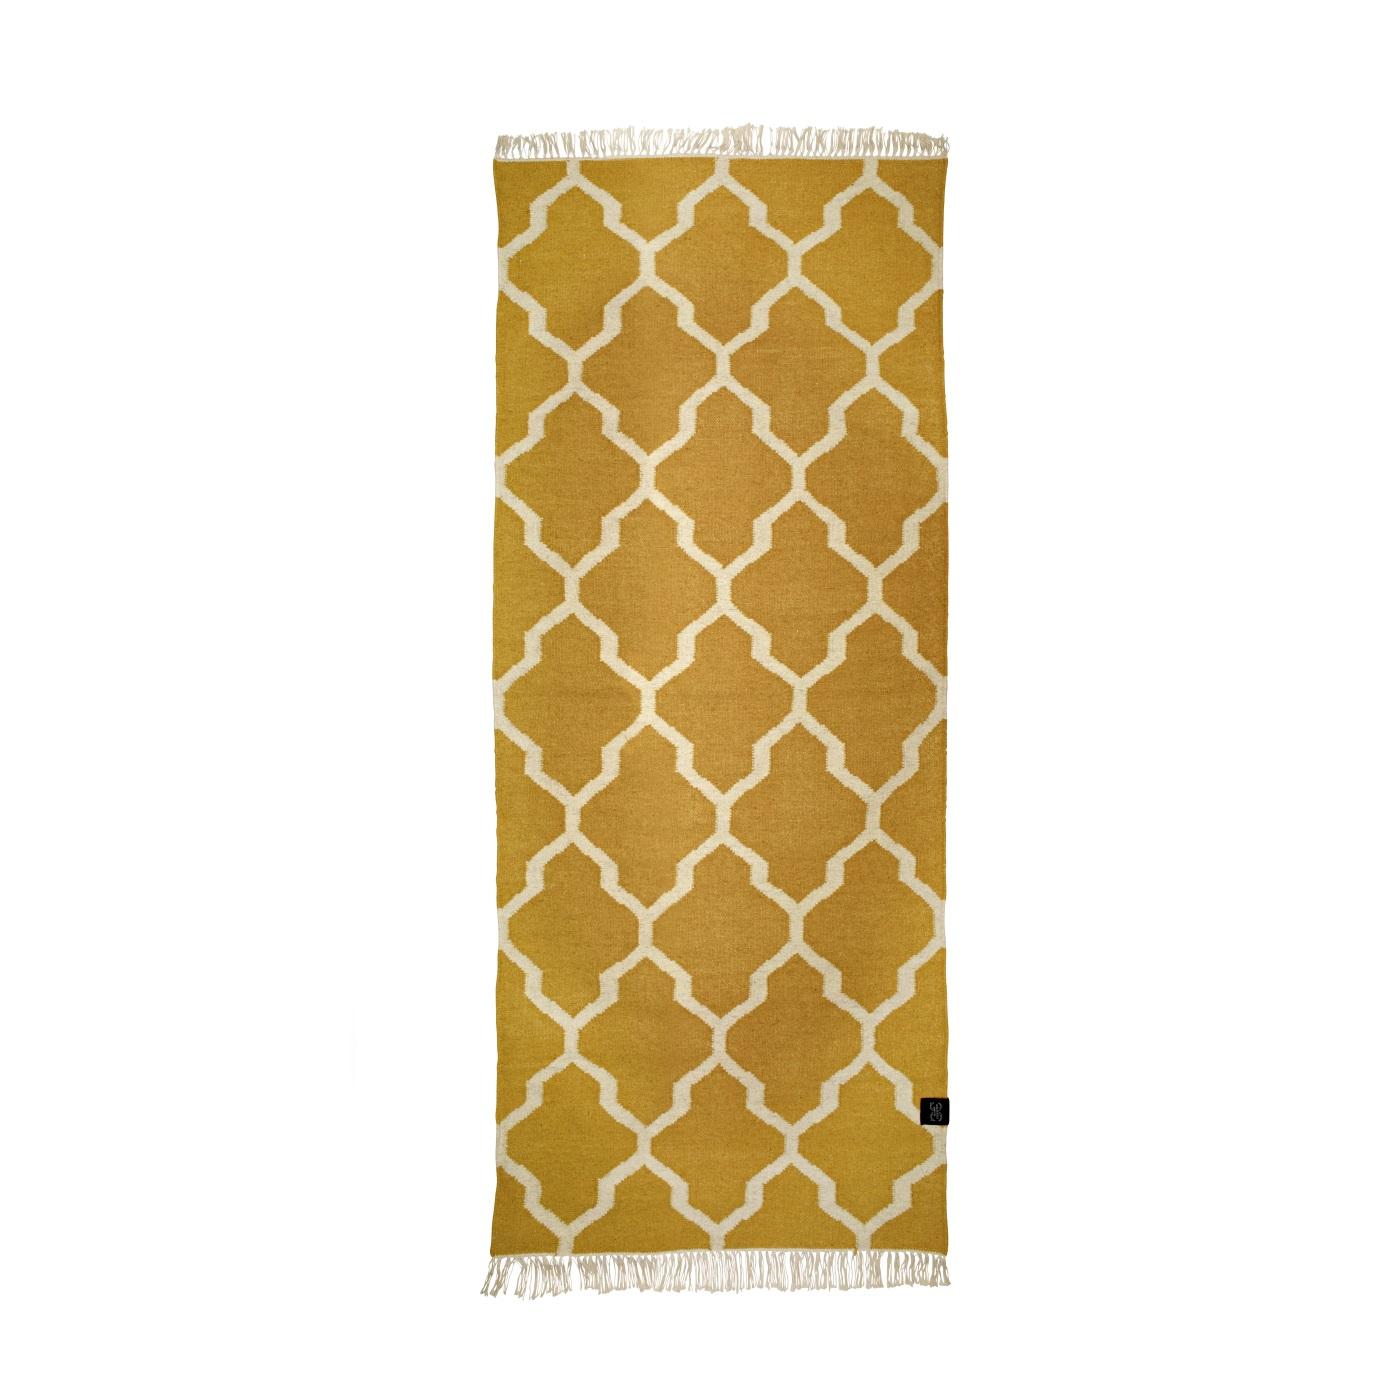 Gångmatta ull Tangier gul 80x200, Classic Collection